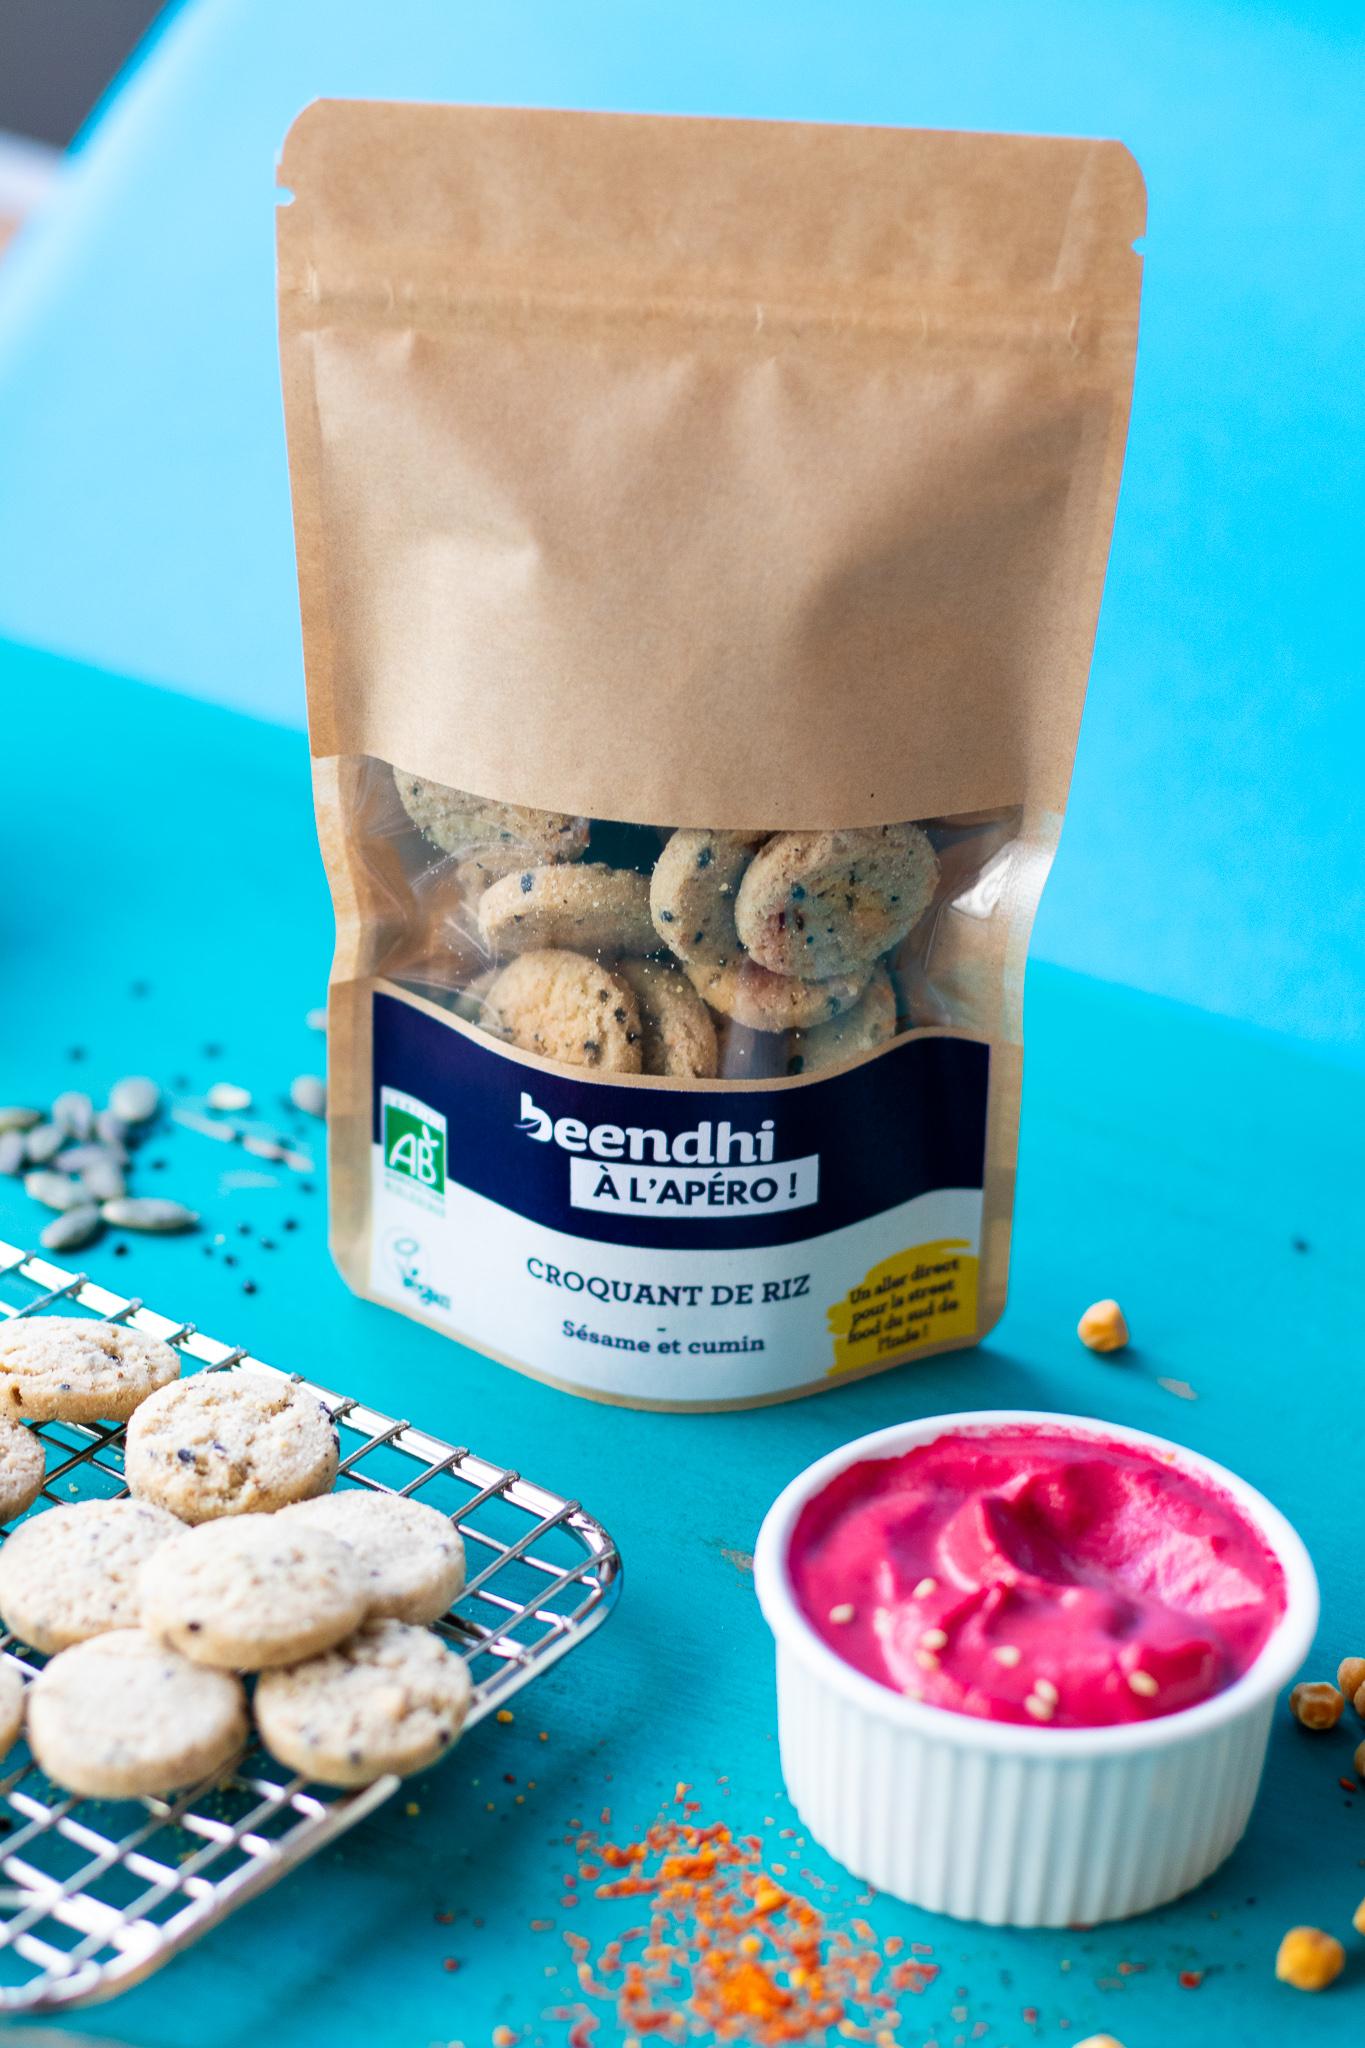 croquant de riz sesame et cumin 90g bio - Des biscuits bio gourmands par Beendhi